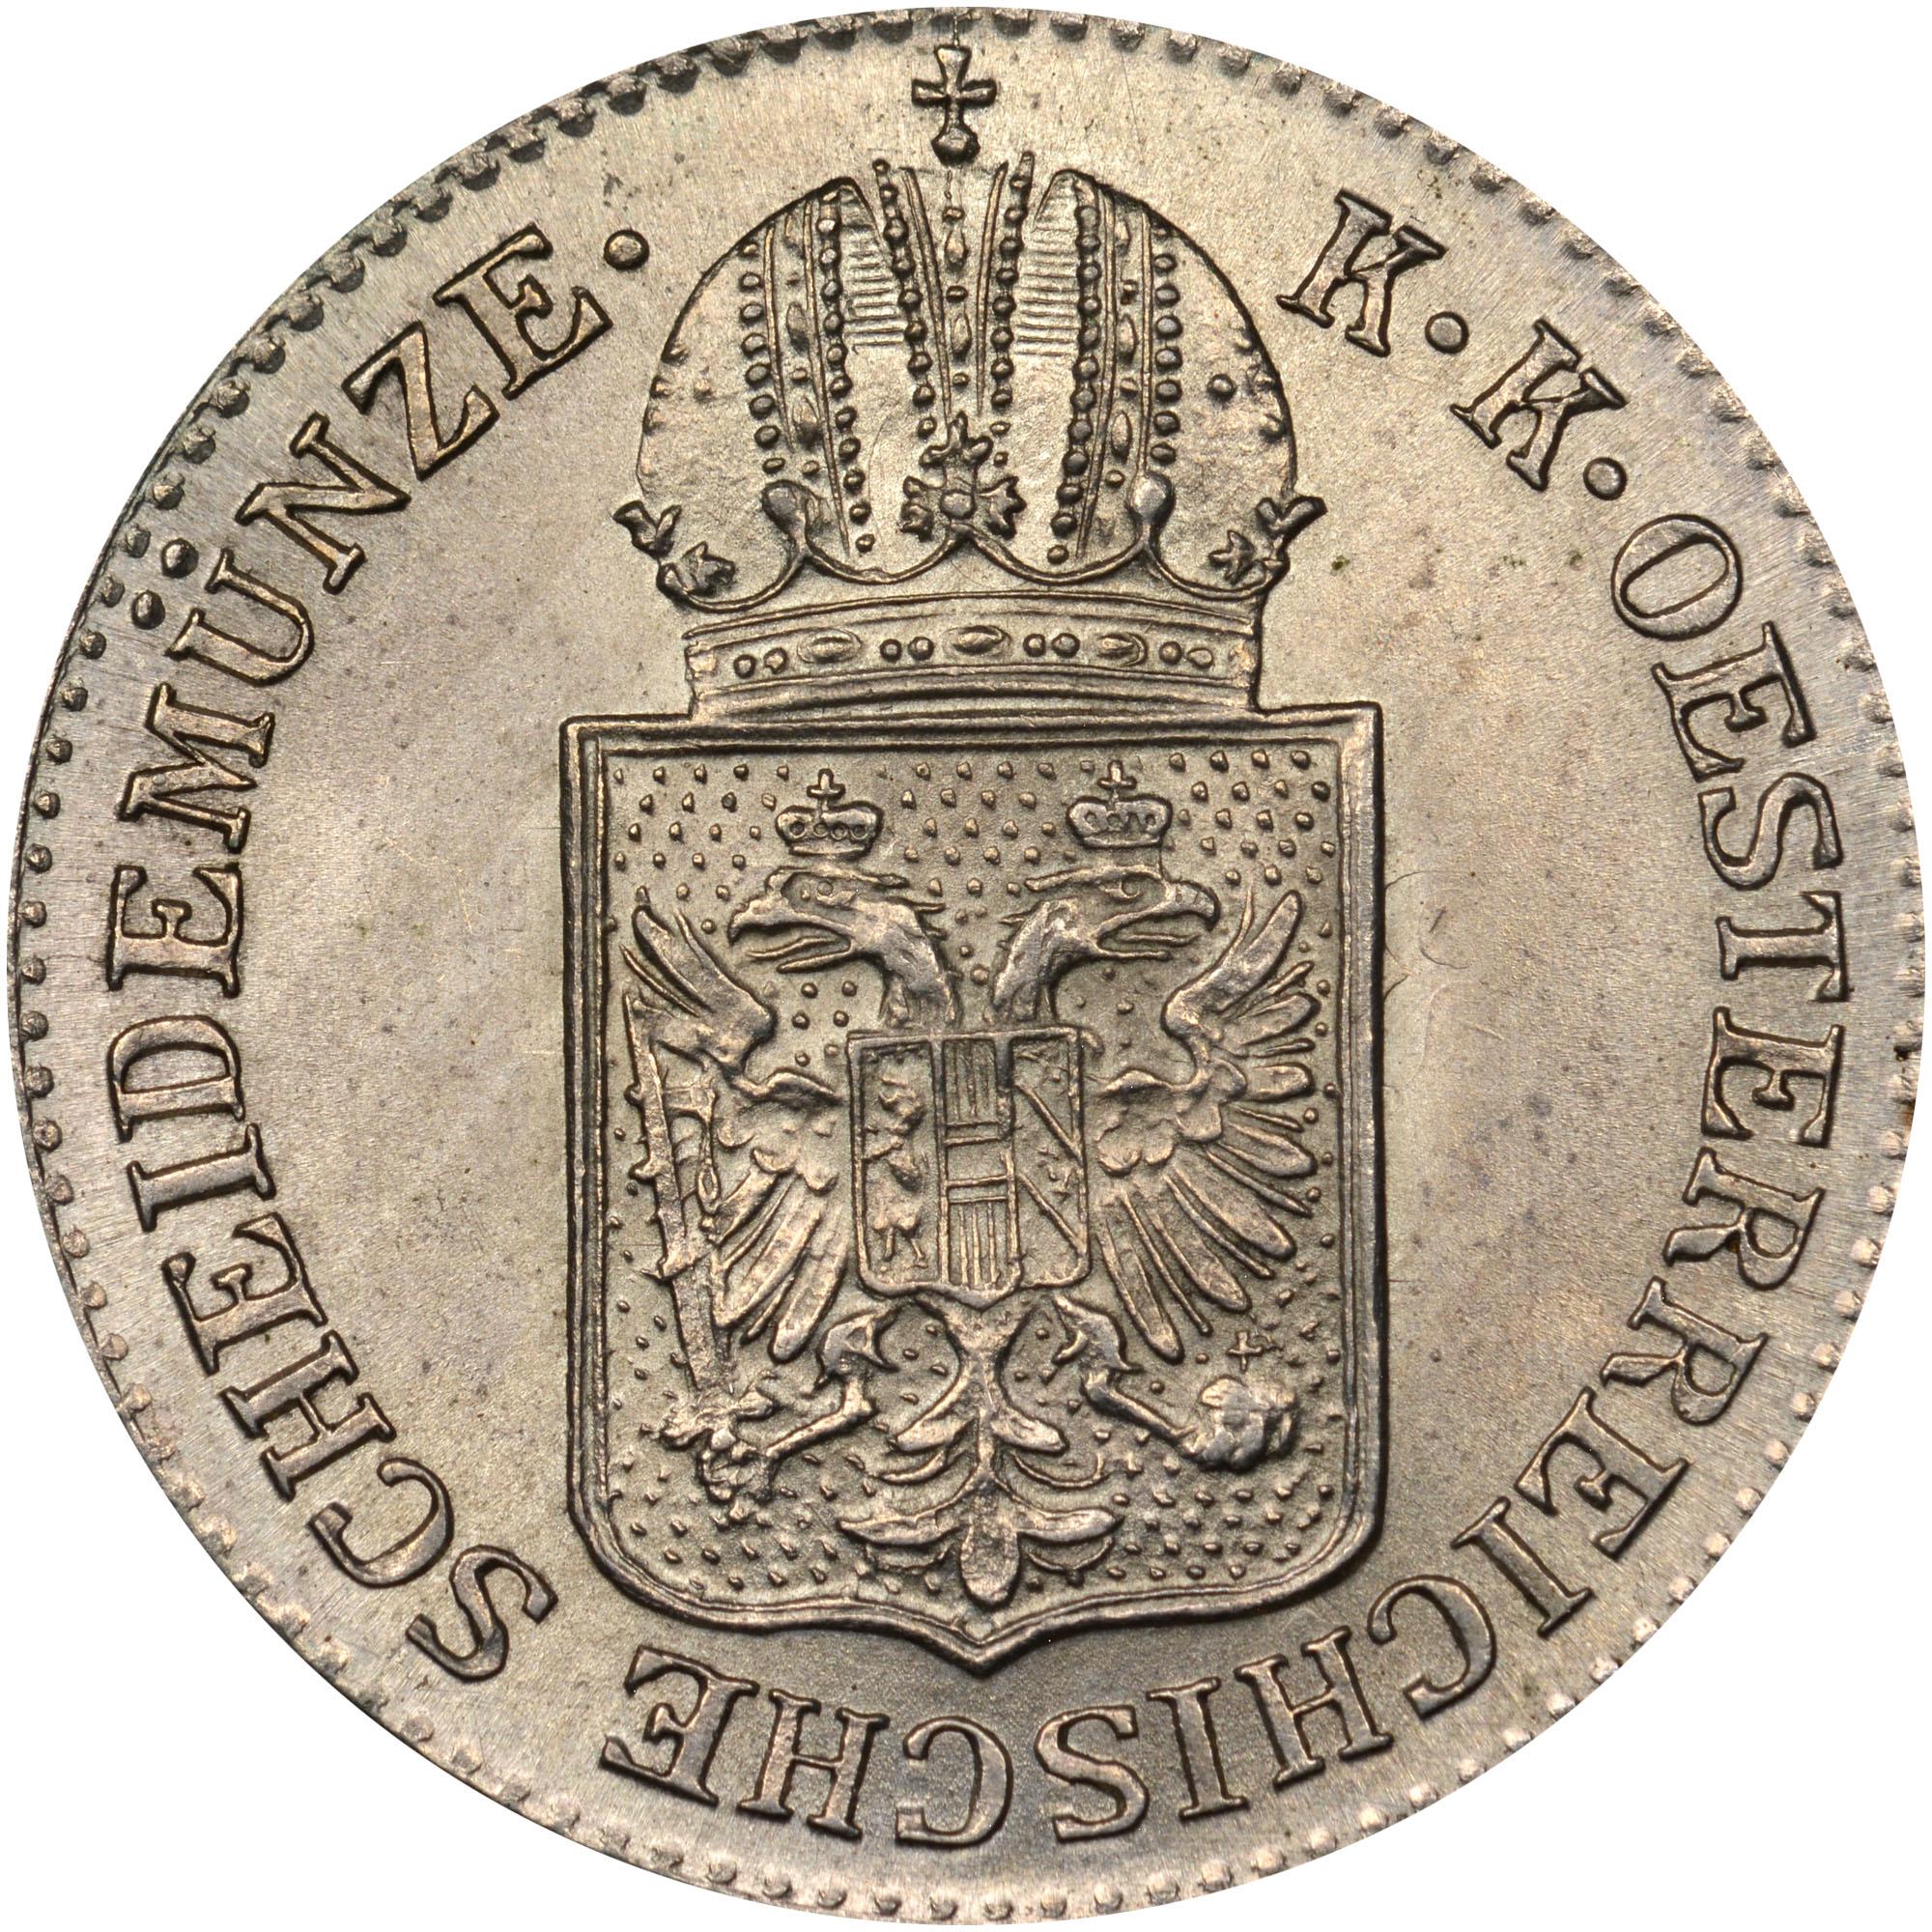 1849 Austria 6 Kreuzer obverse